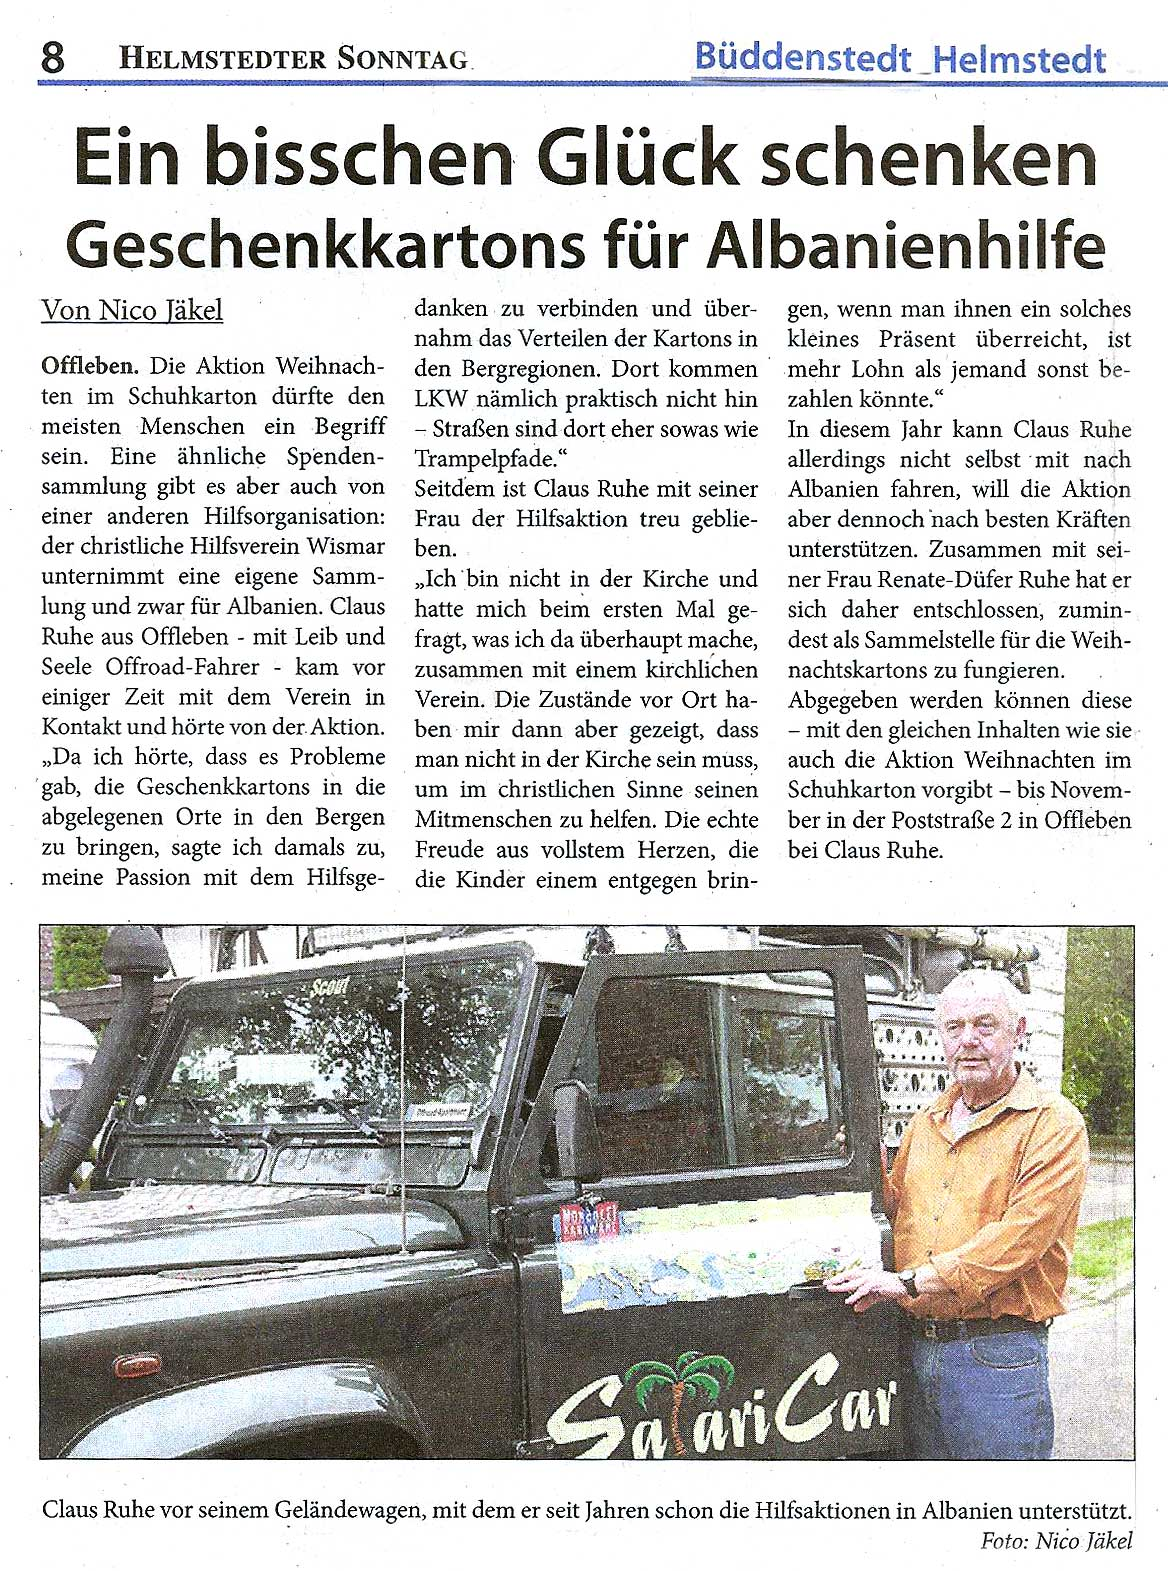 Bericht im Helmstedter Sonntag, 02.10.2016